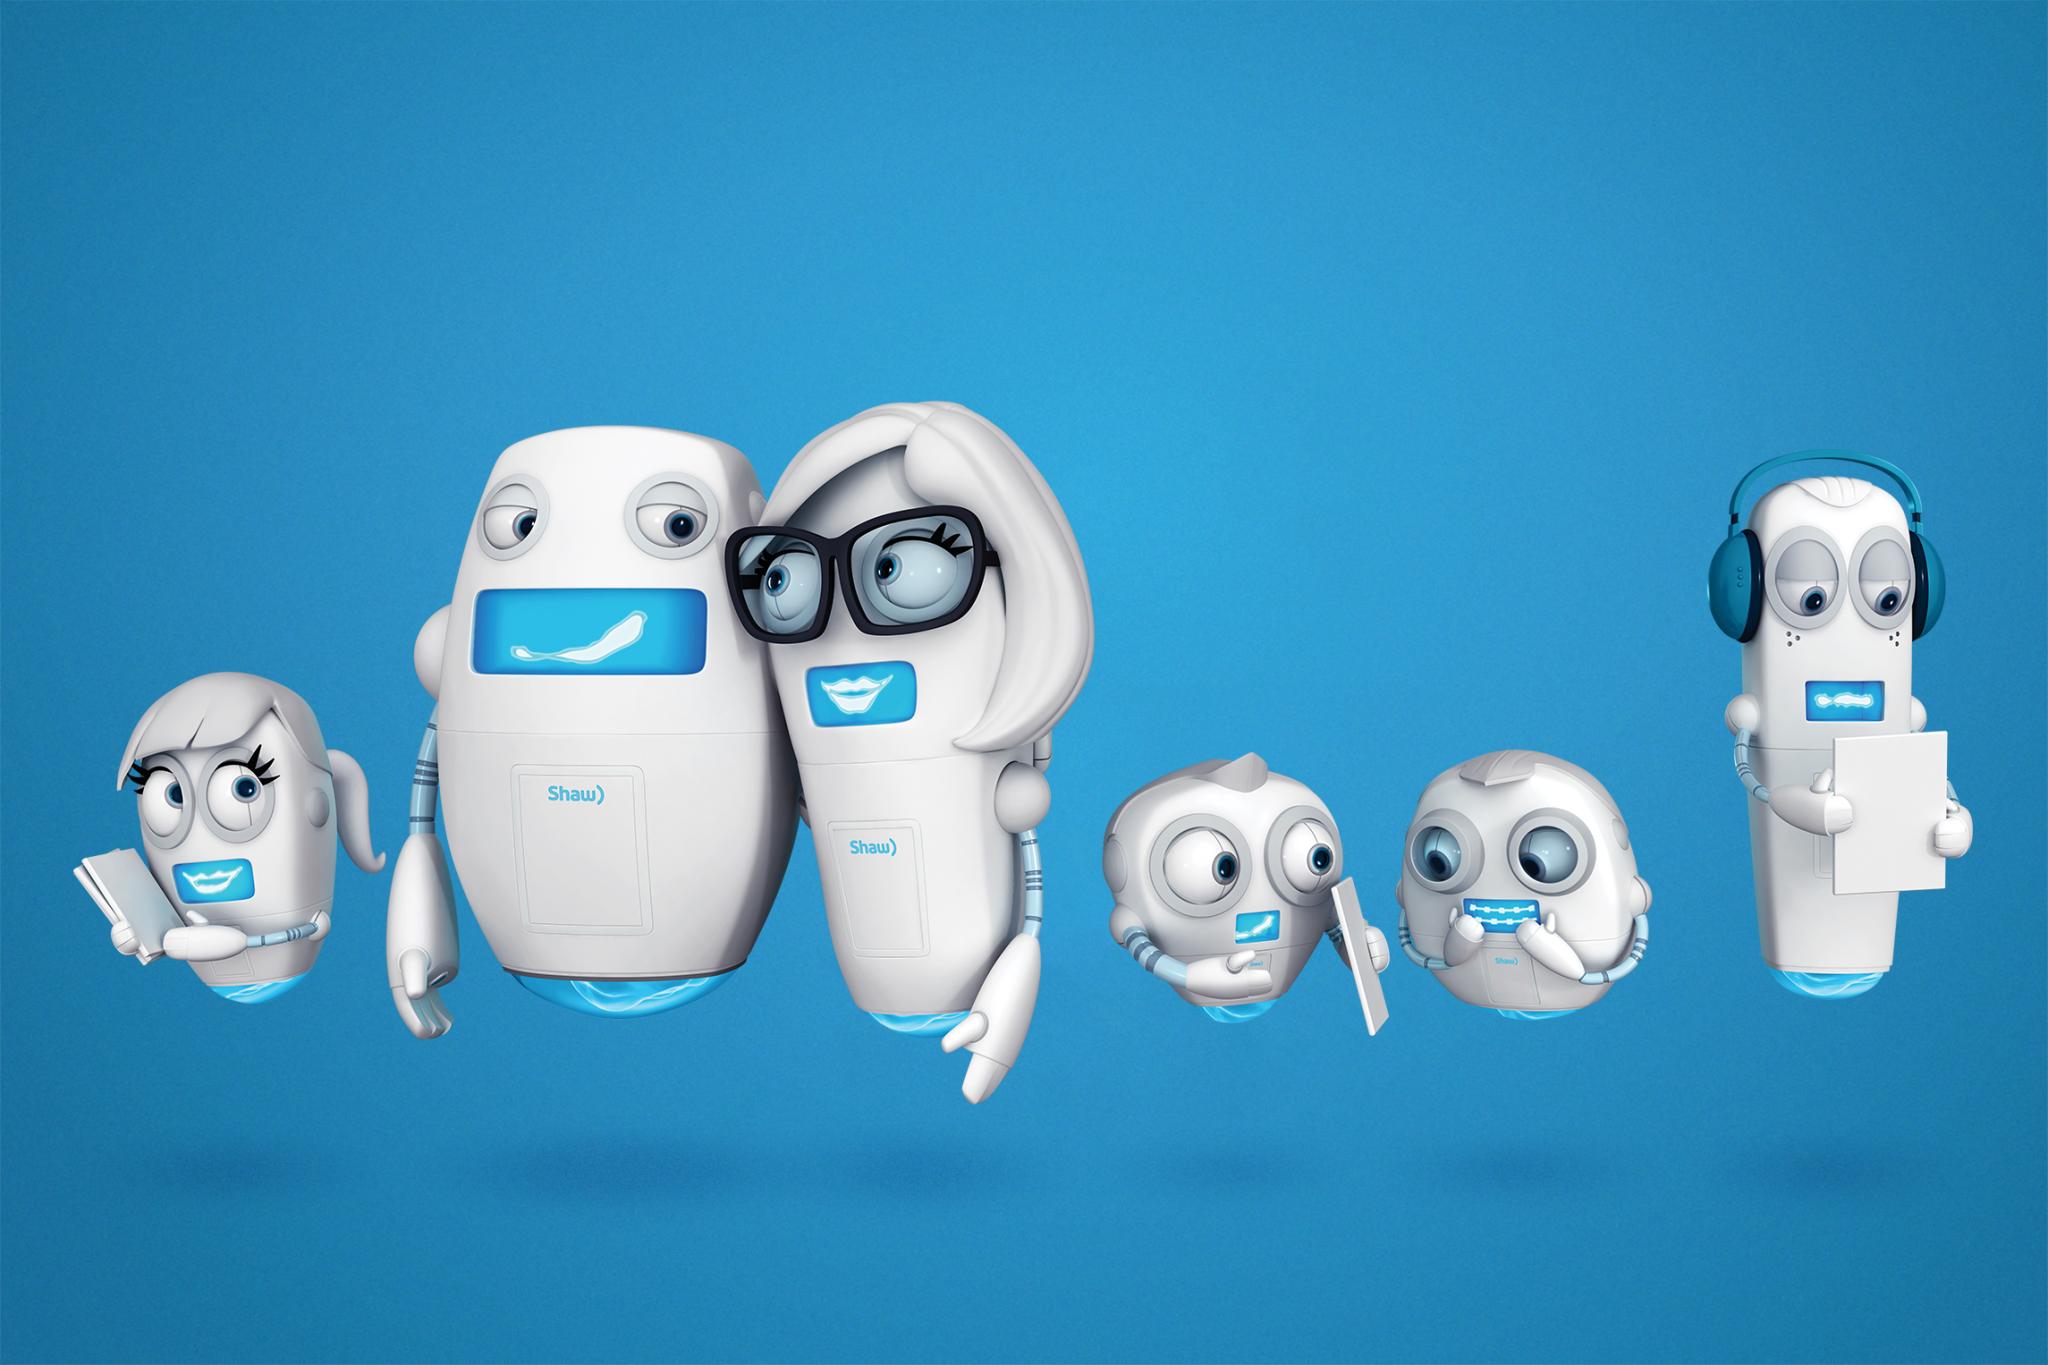 Shaw Bot Family